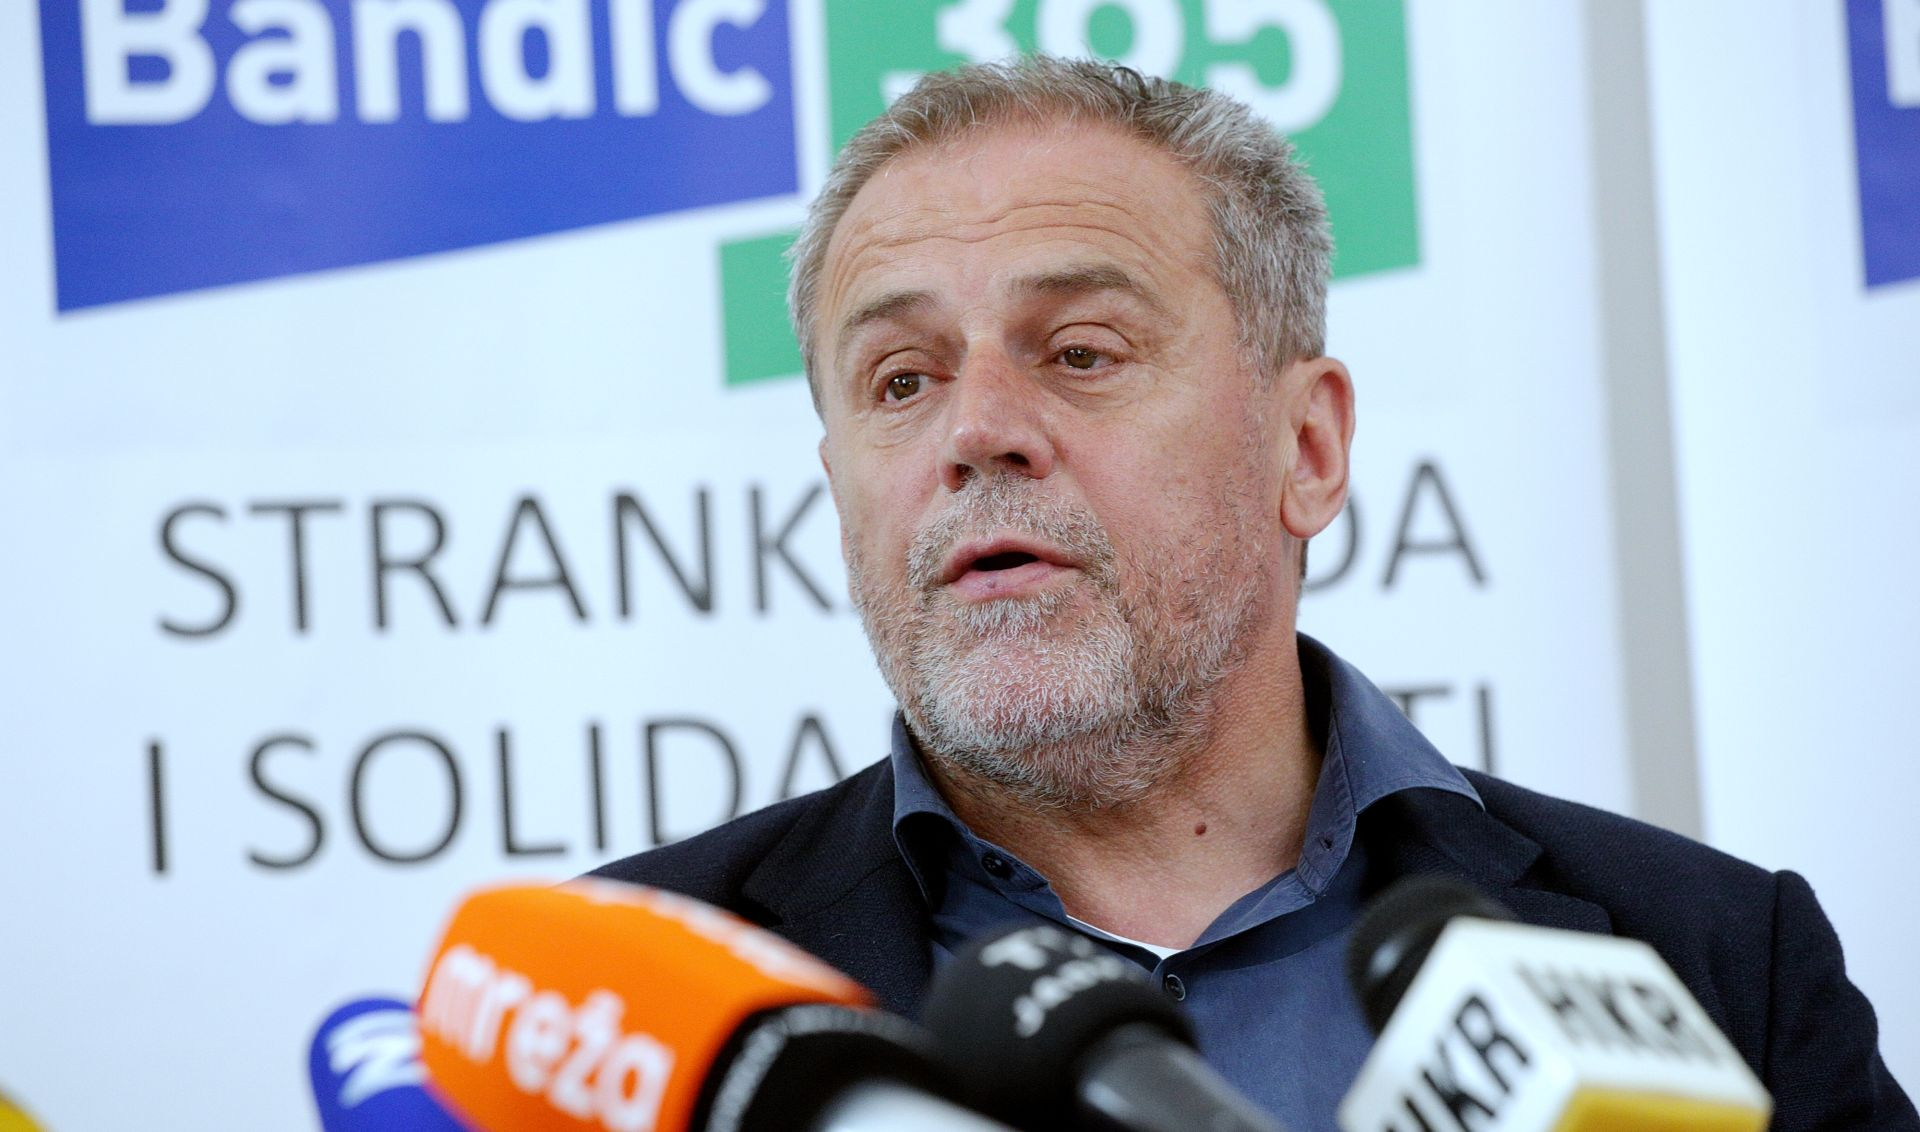 ZAJEDNO NA LOKALNE IZBORE Osnovan Klub gradskih zastupnika Milana Bandića i HSS-a